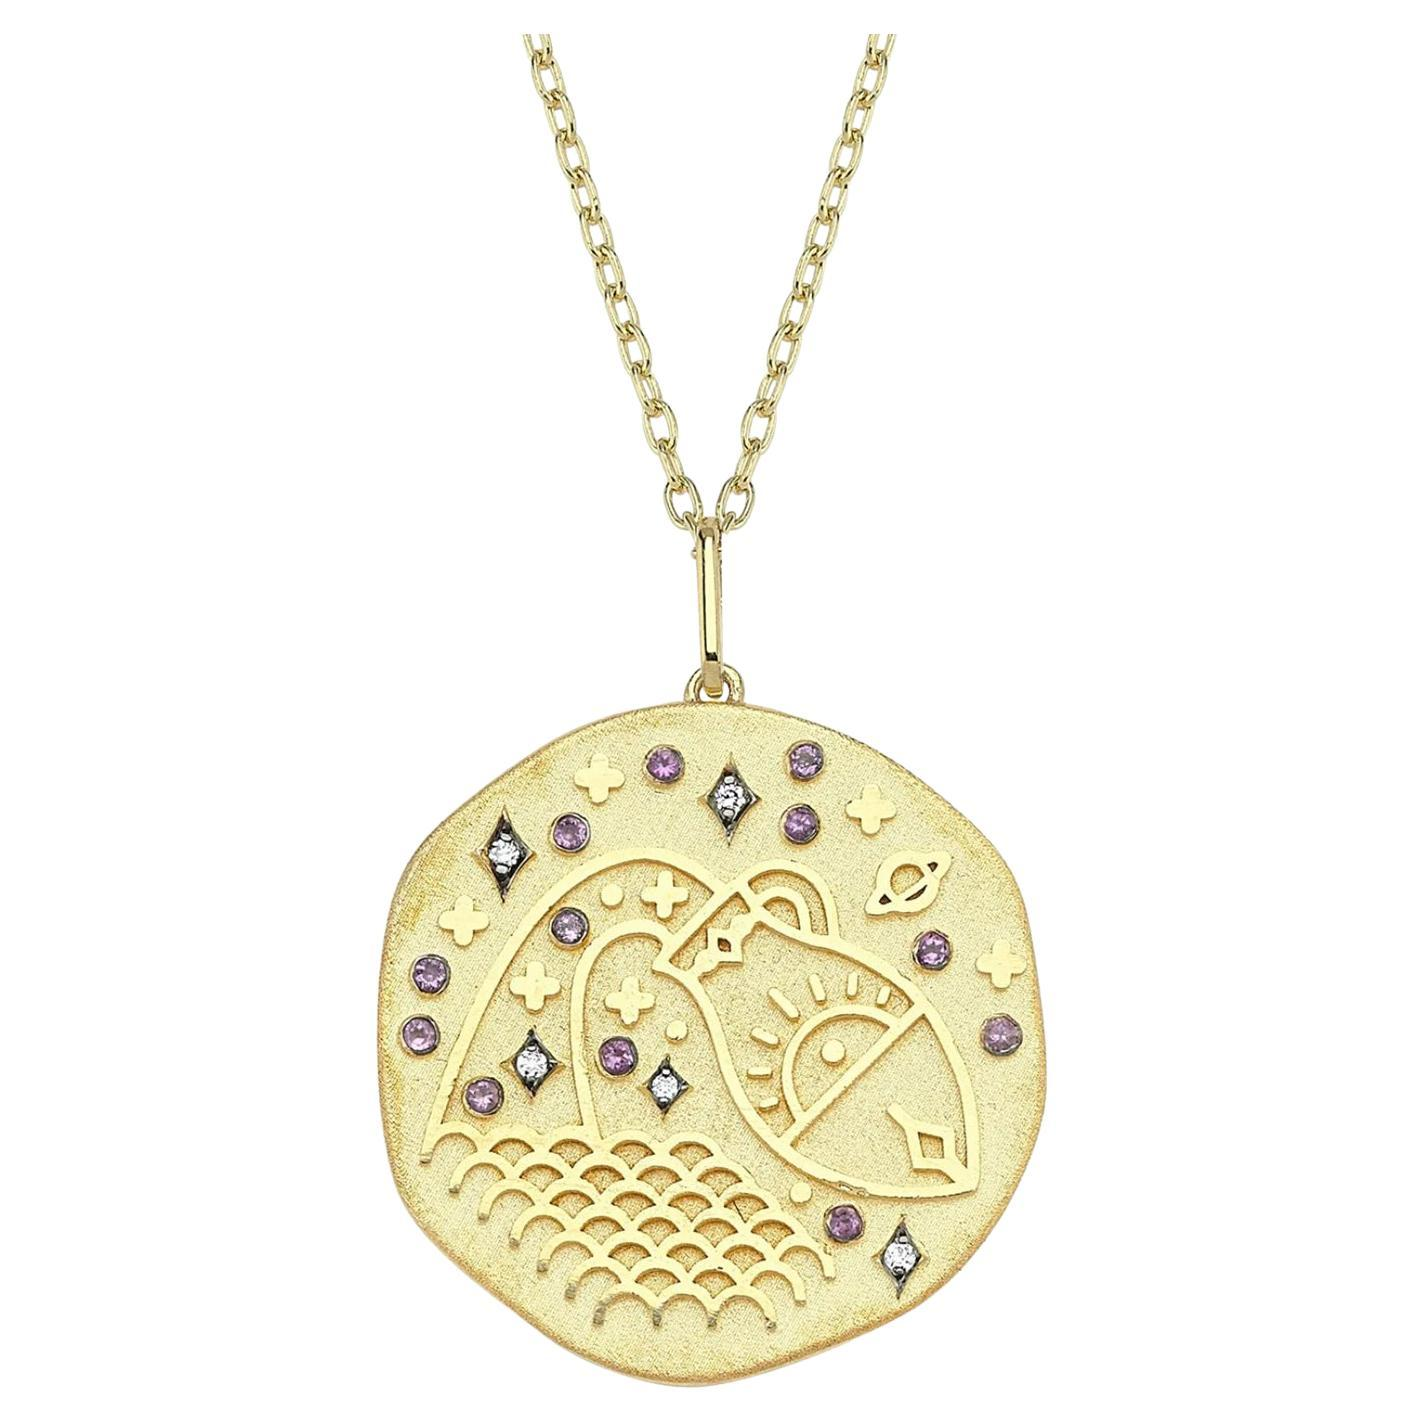 Aquarius Zodiac Charm Necklace, Lucky Stone Diamond and Amethyst 14K Yellow Gold